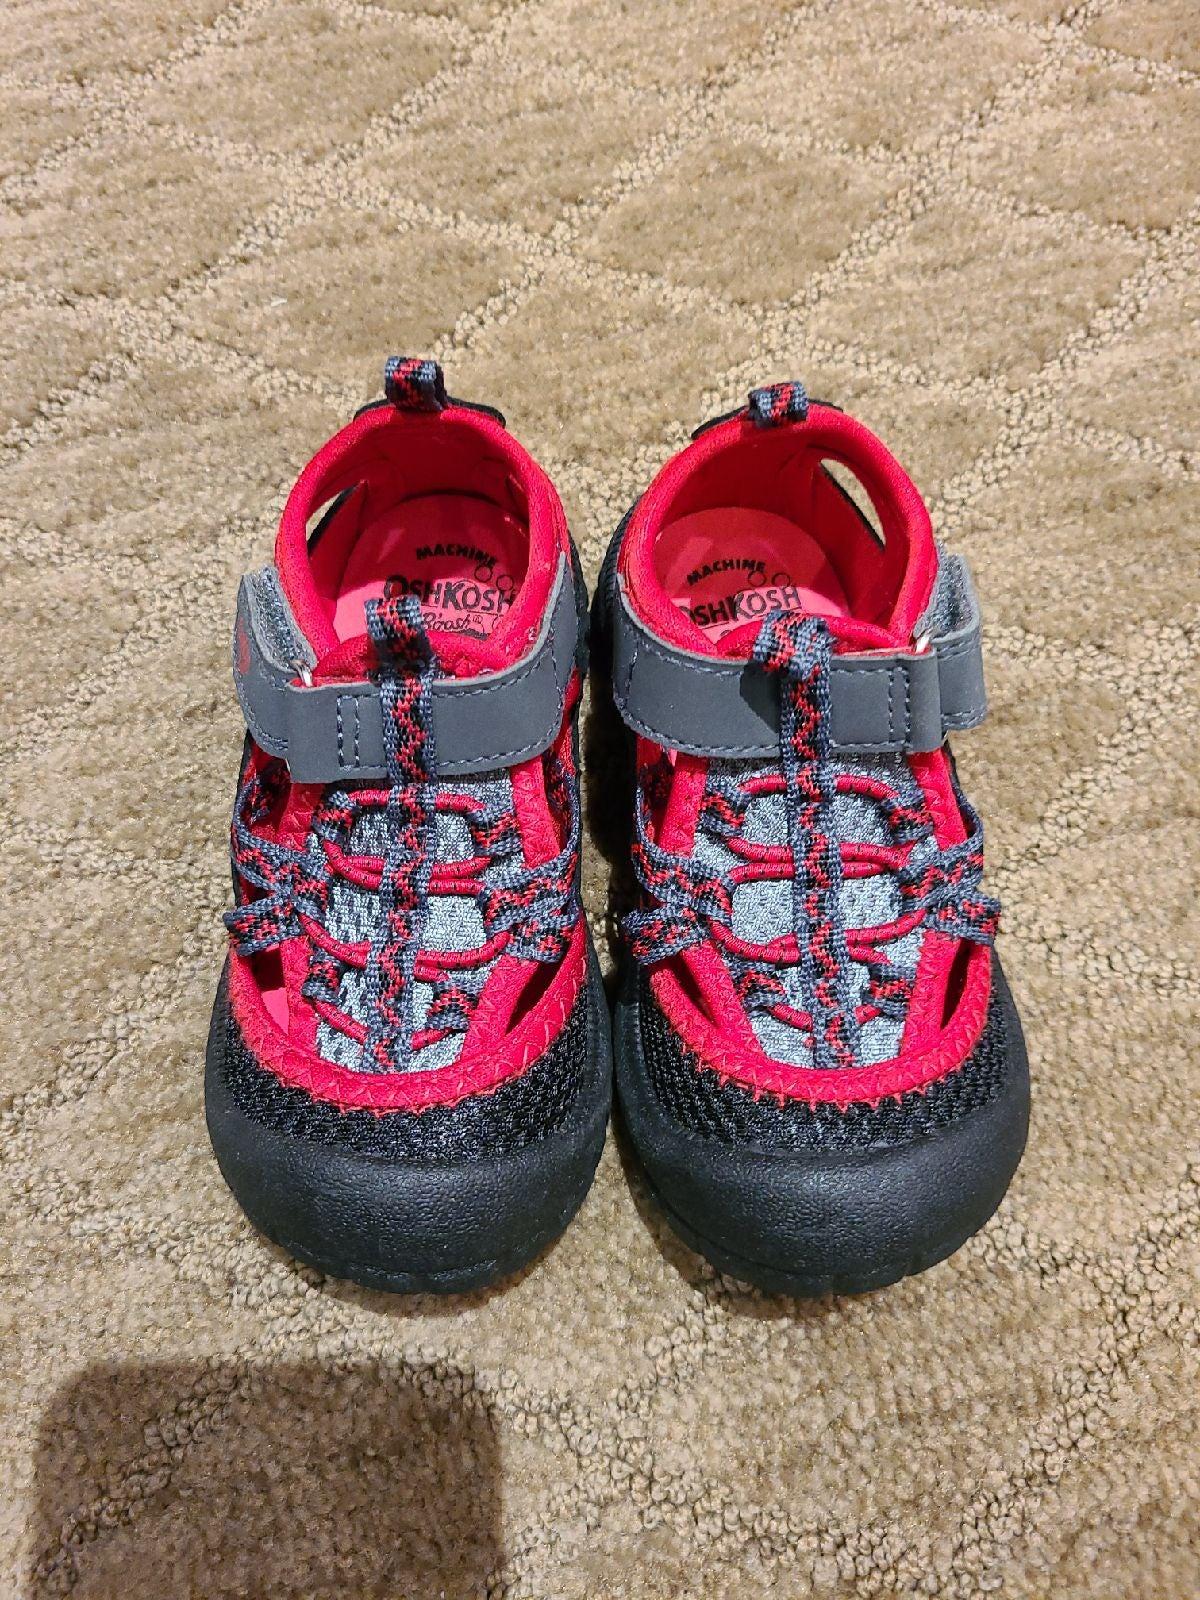 New Osh kosh toddler boys sandals